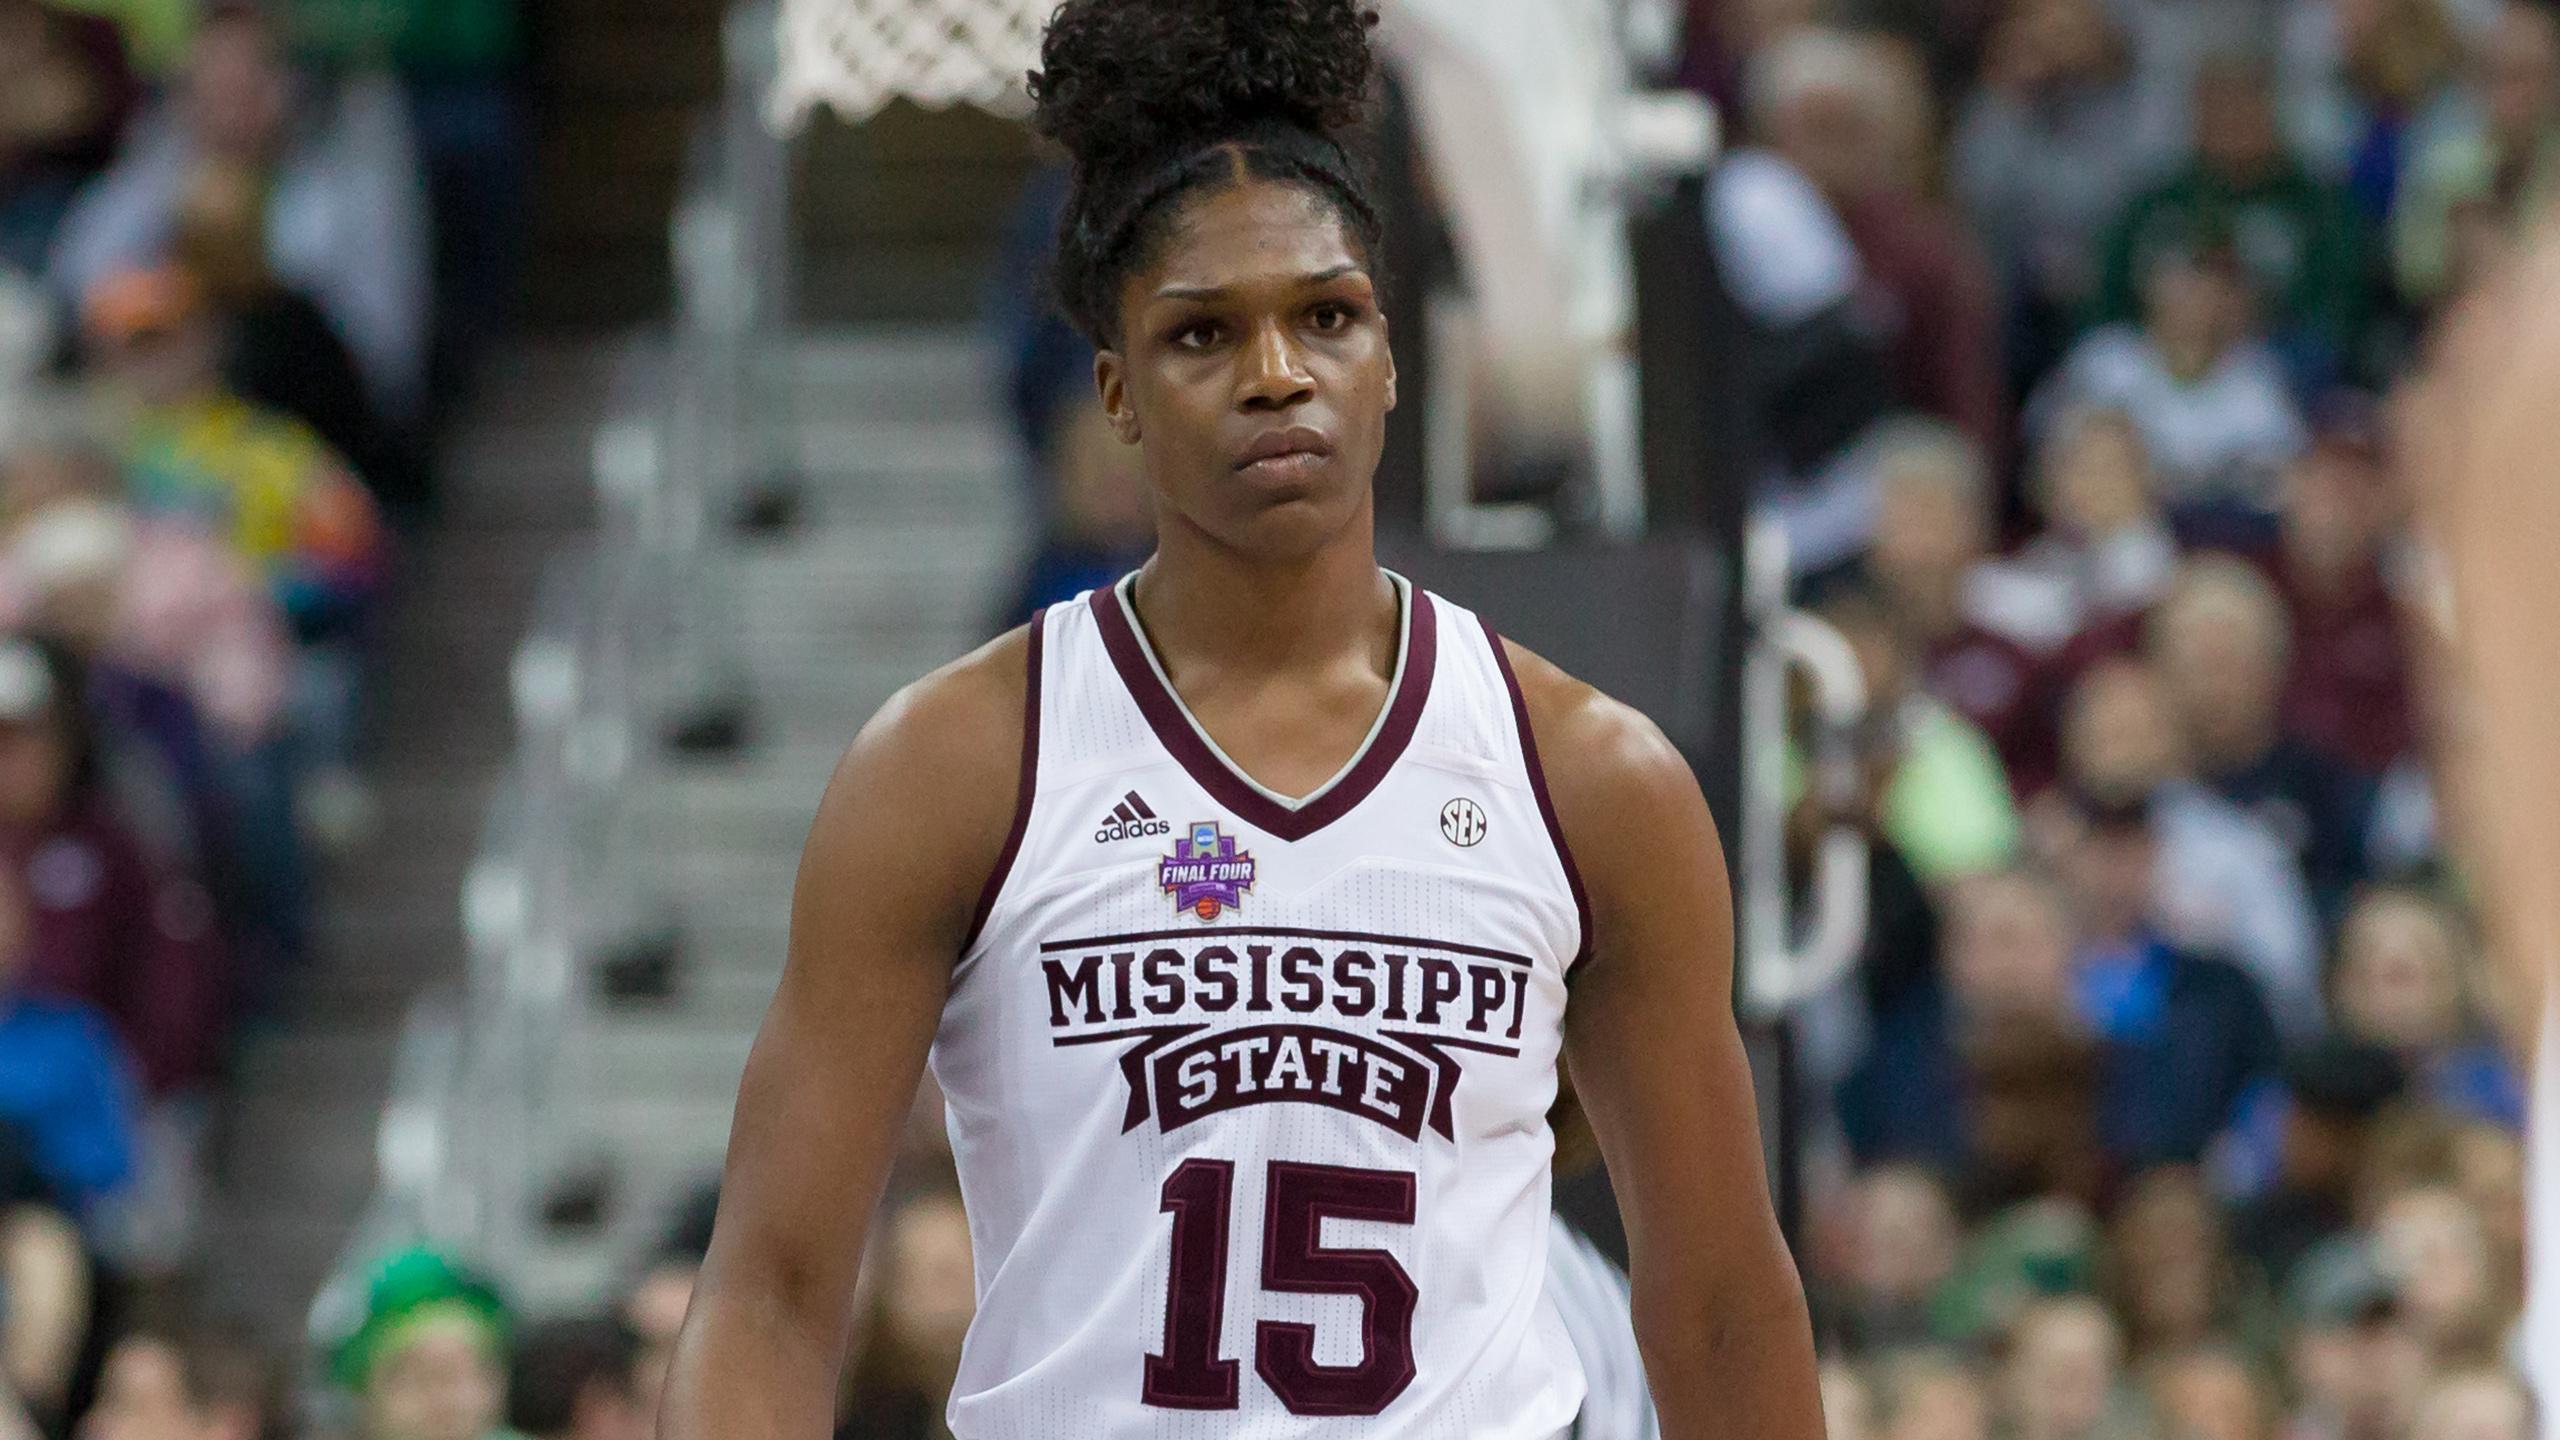 #7 Mississippi State vs. LSU